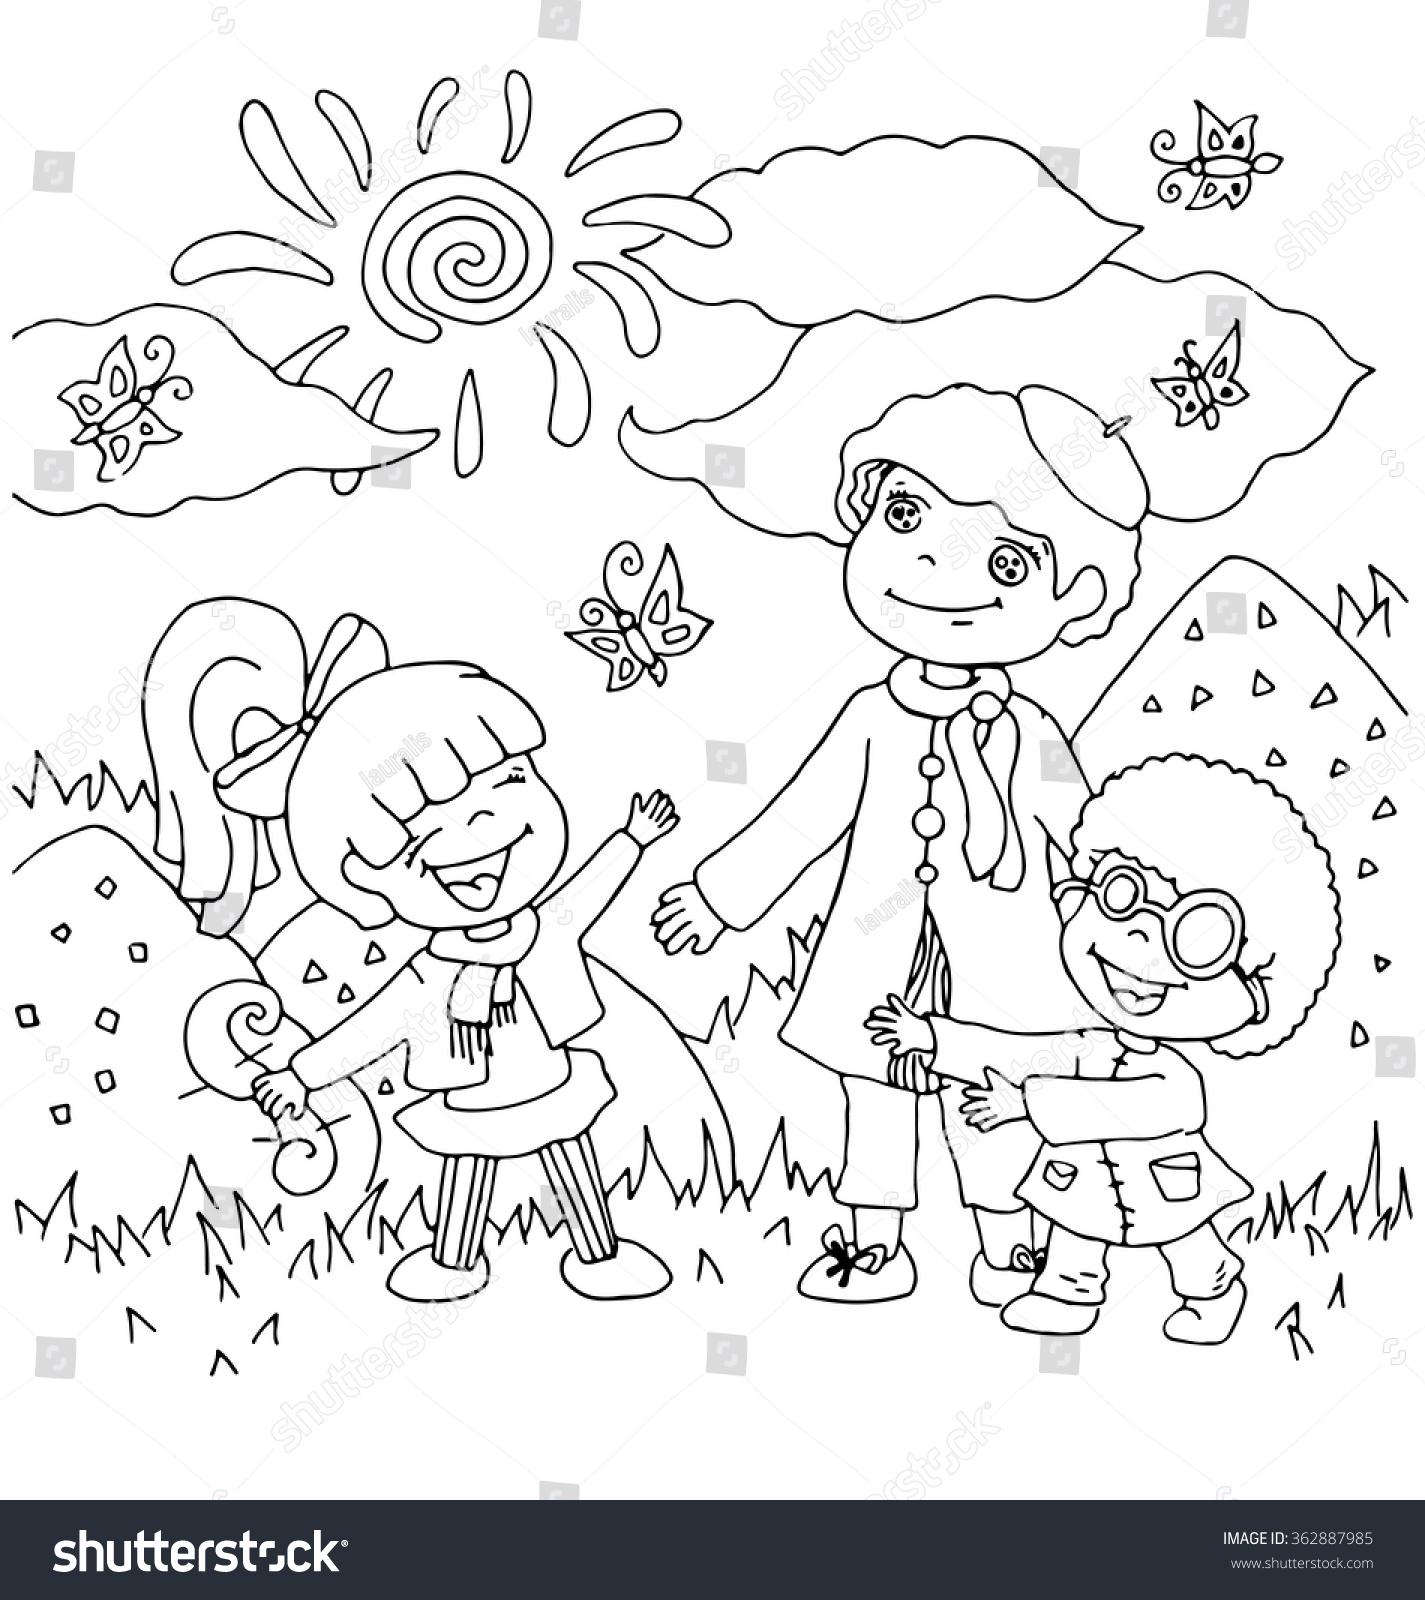 Children Kindergarten Teacher Cartoon Hand Drawn Stock